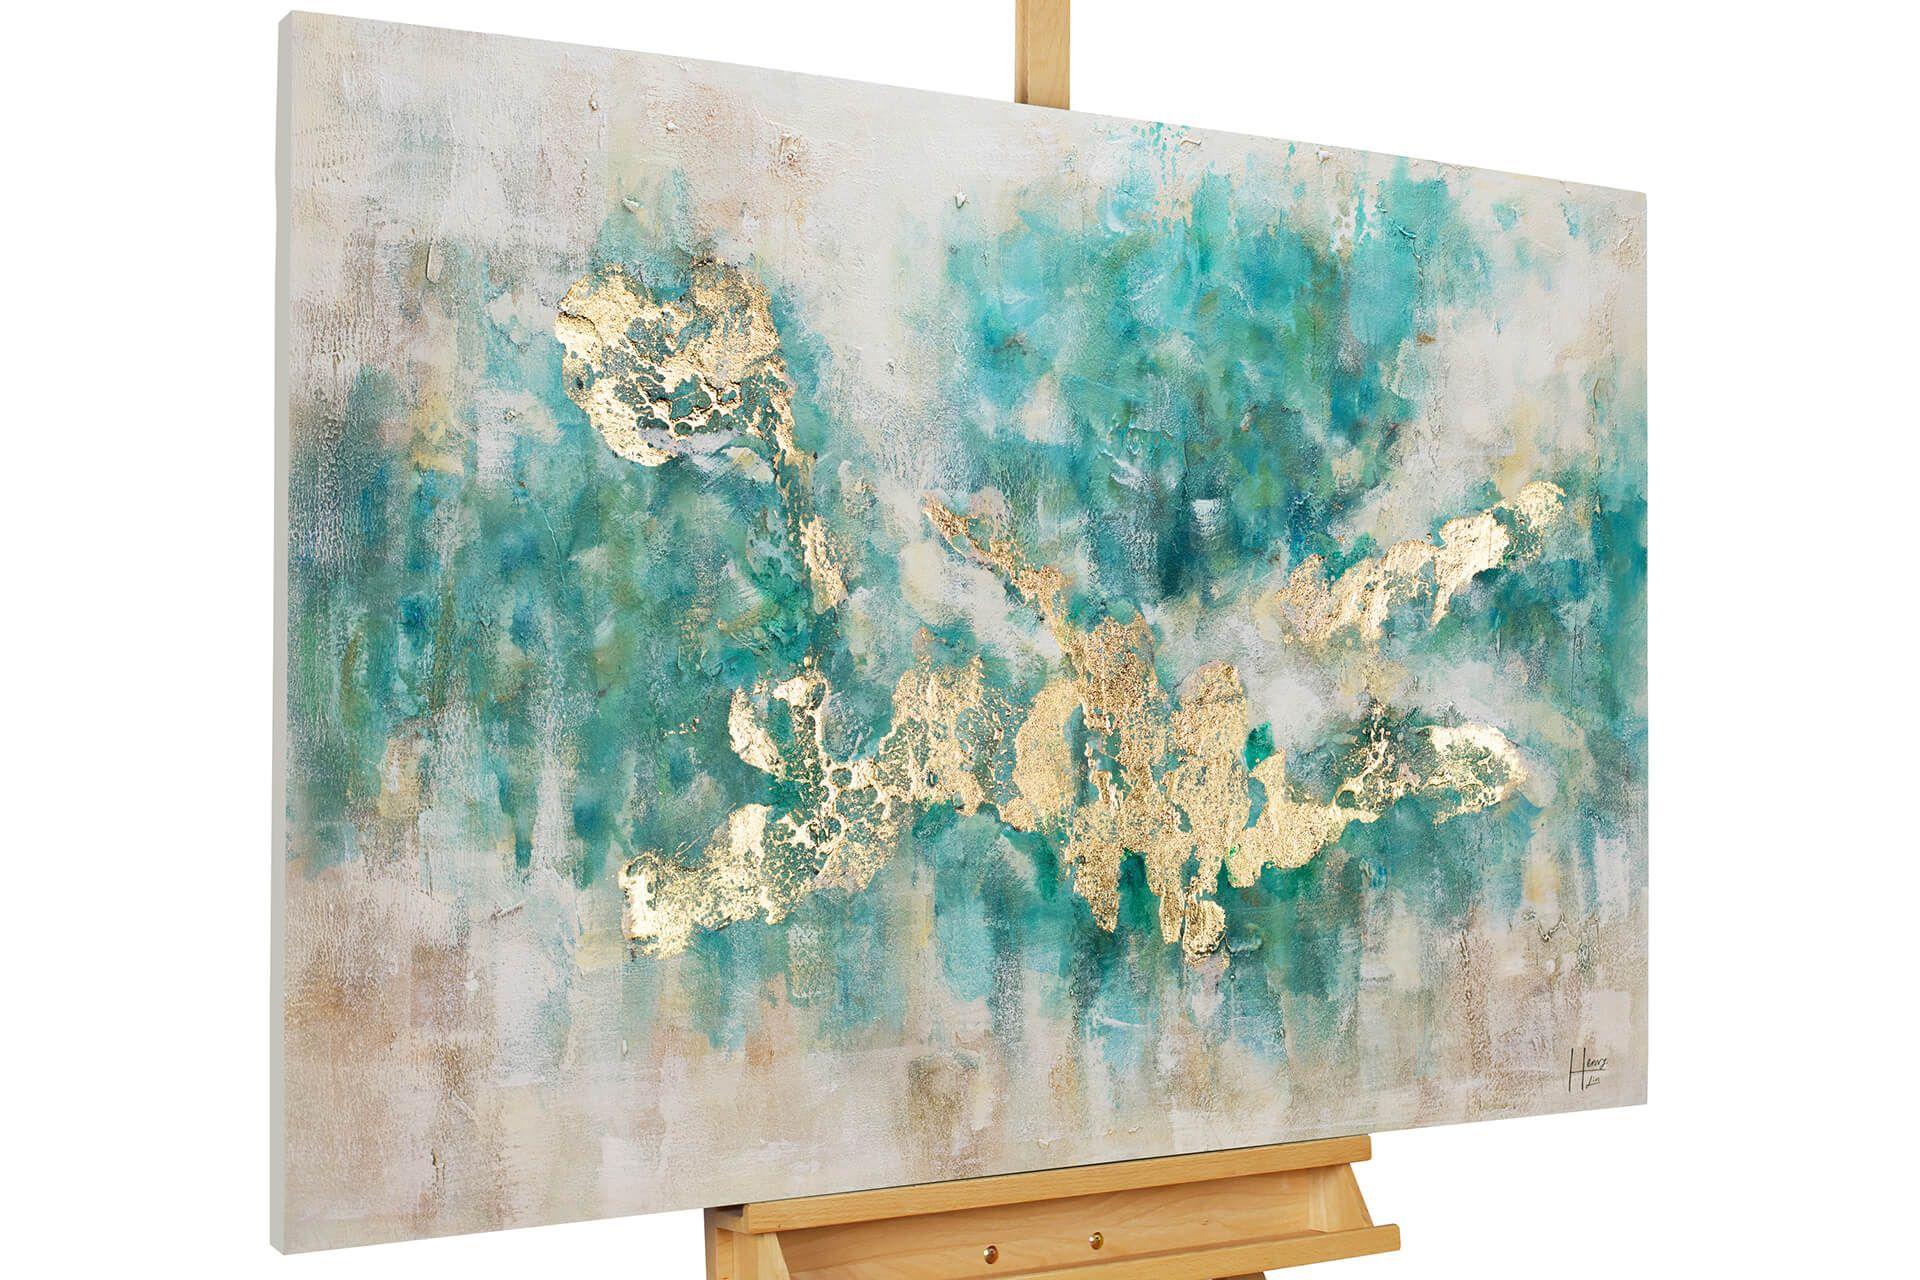 acryl gemalde consciousness 120x80cm leinwandkunst abstrakt bilder leinwand acrylbilder moderne kunst etsy gemälde